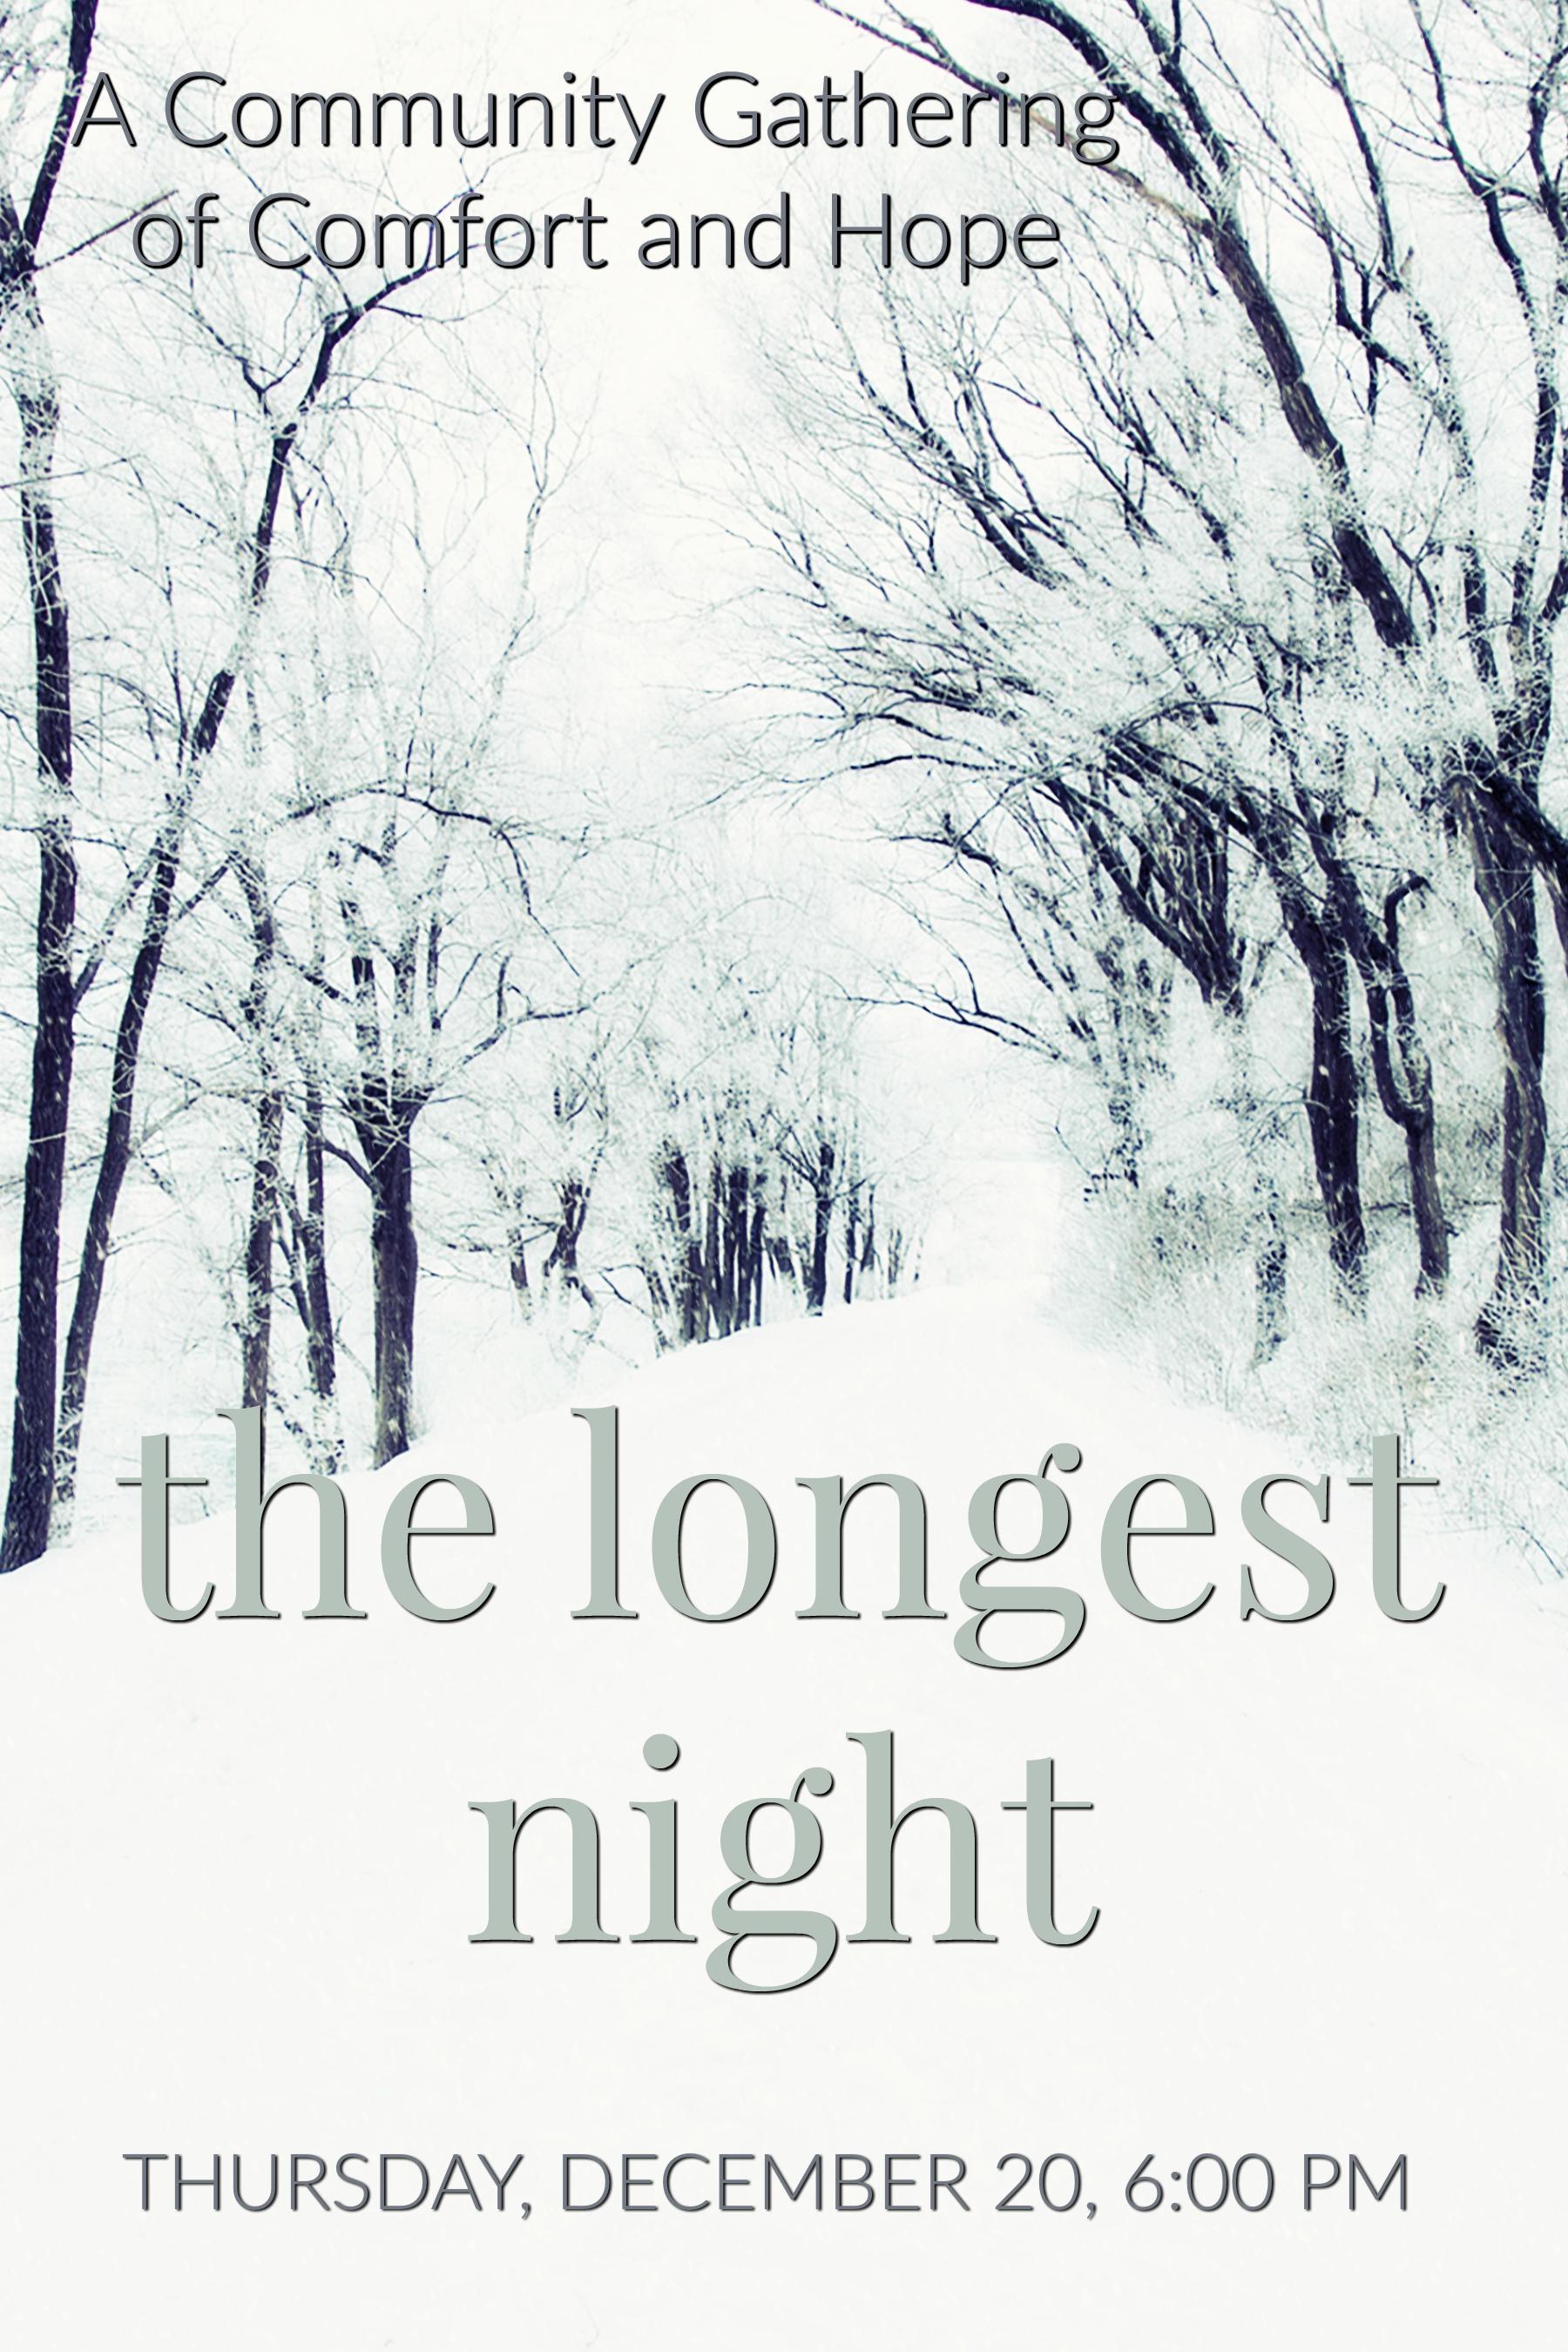 The Longest Nightnew2018.jpg